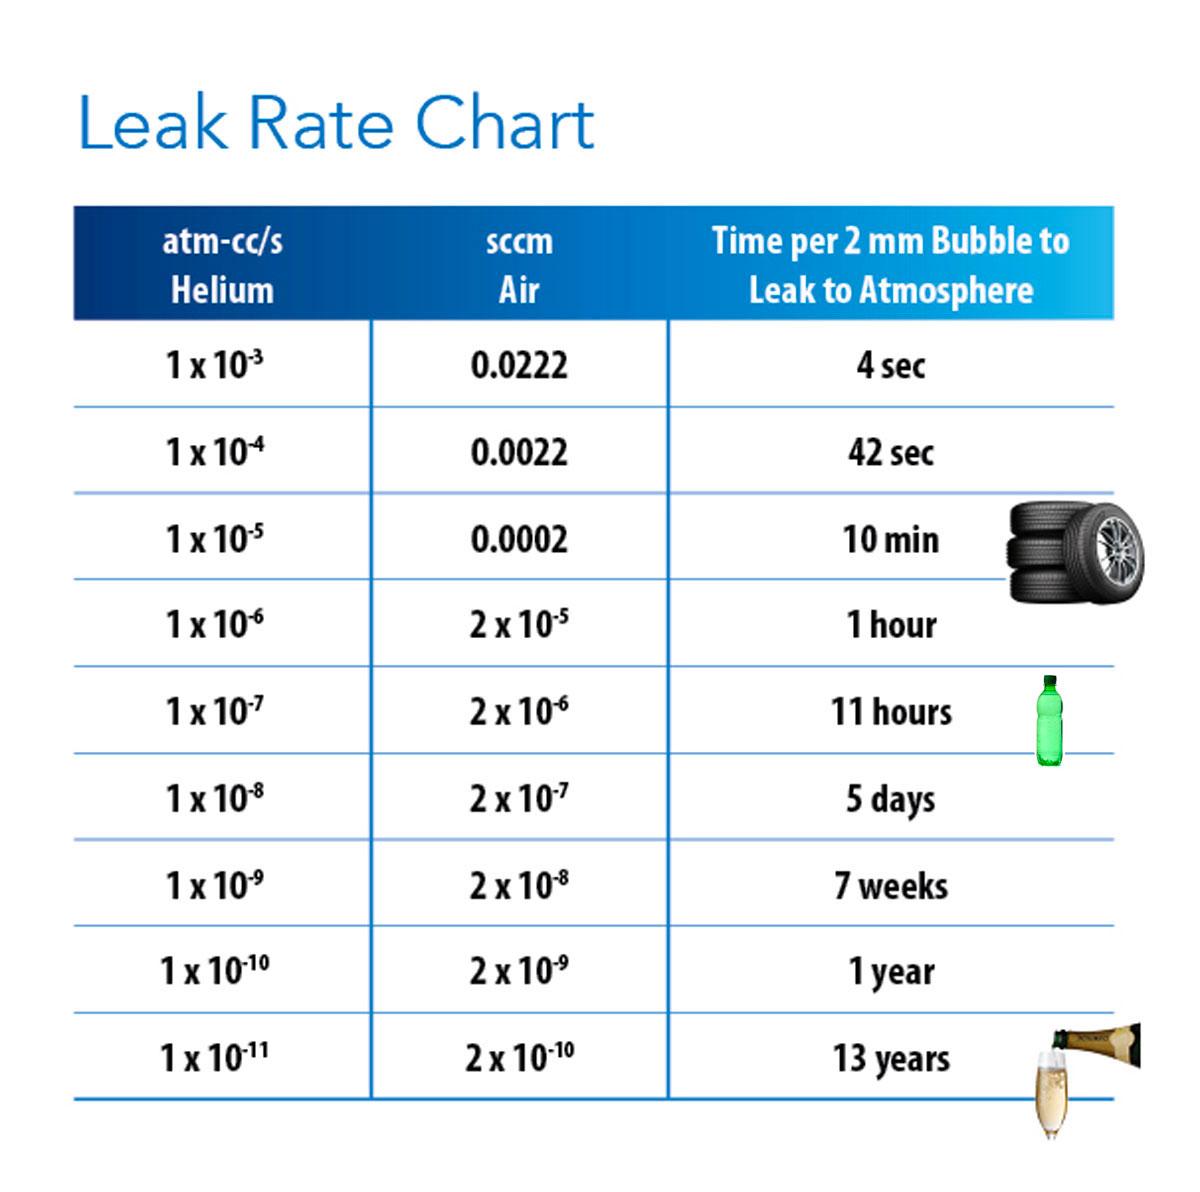 Leak Rate Chart